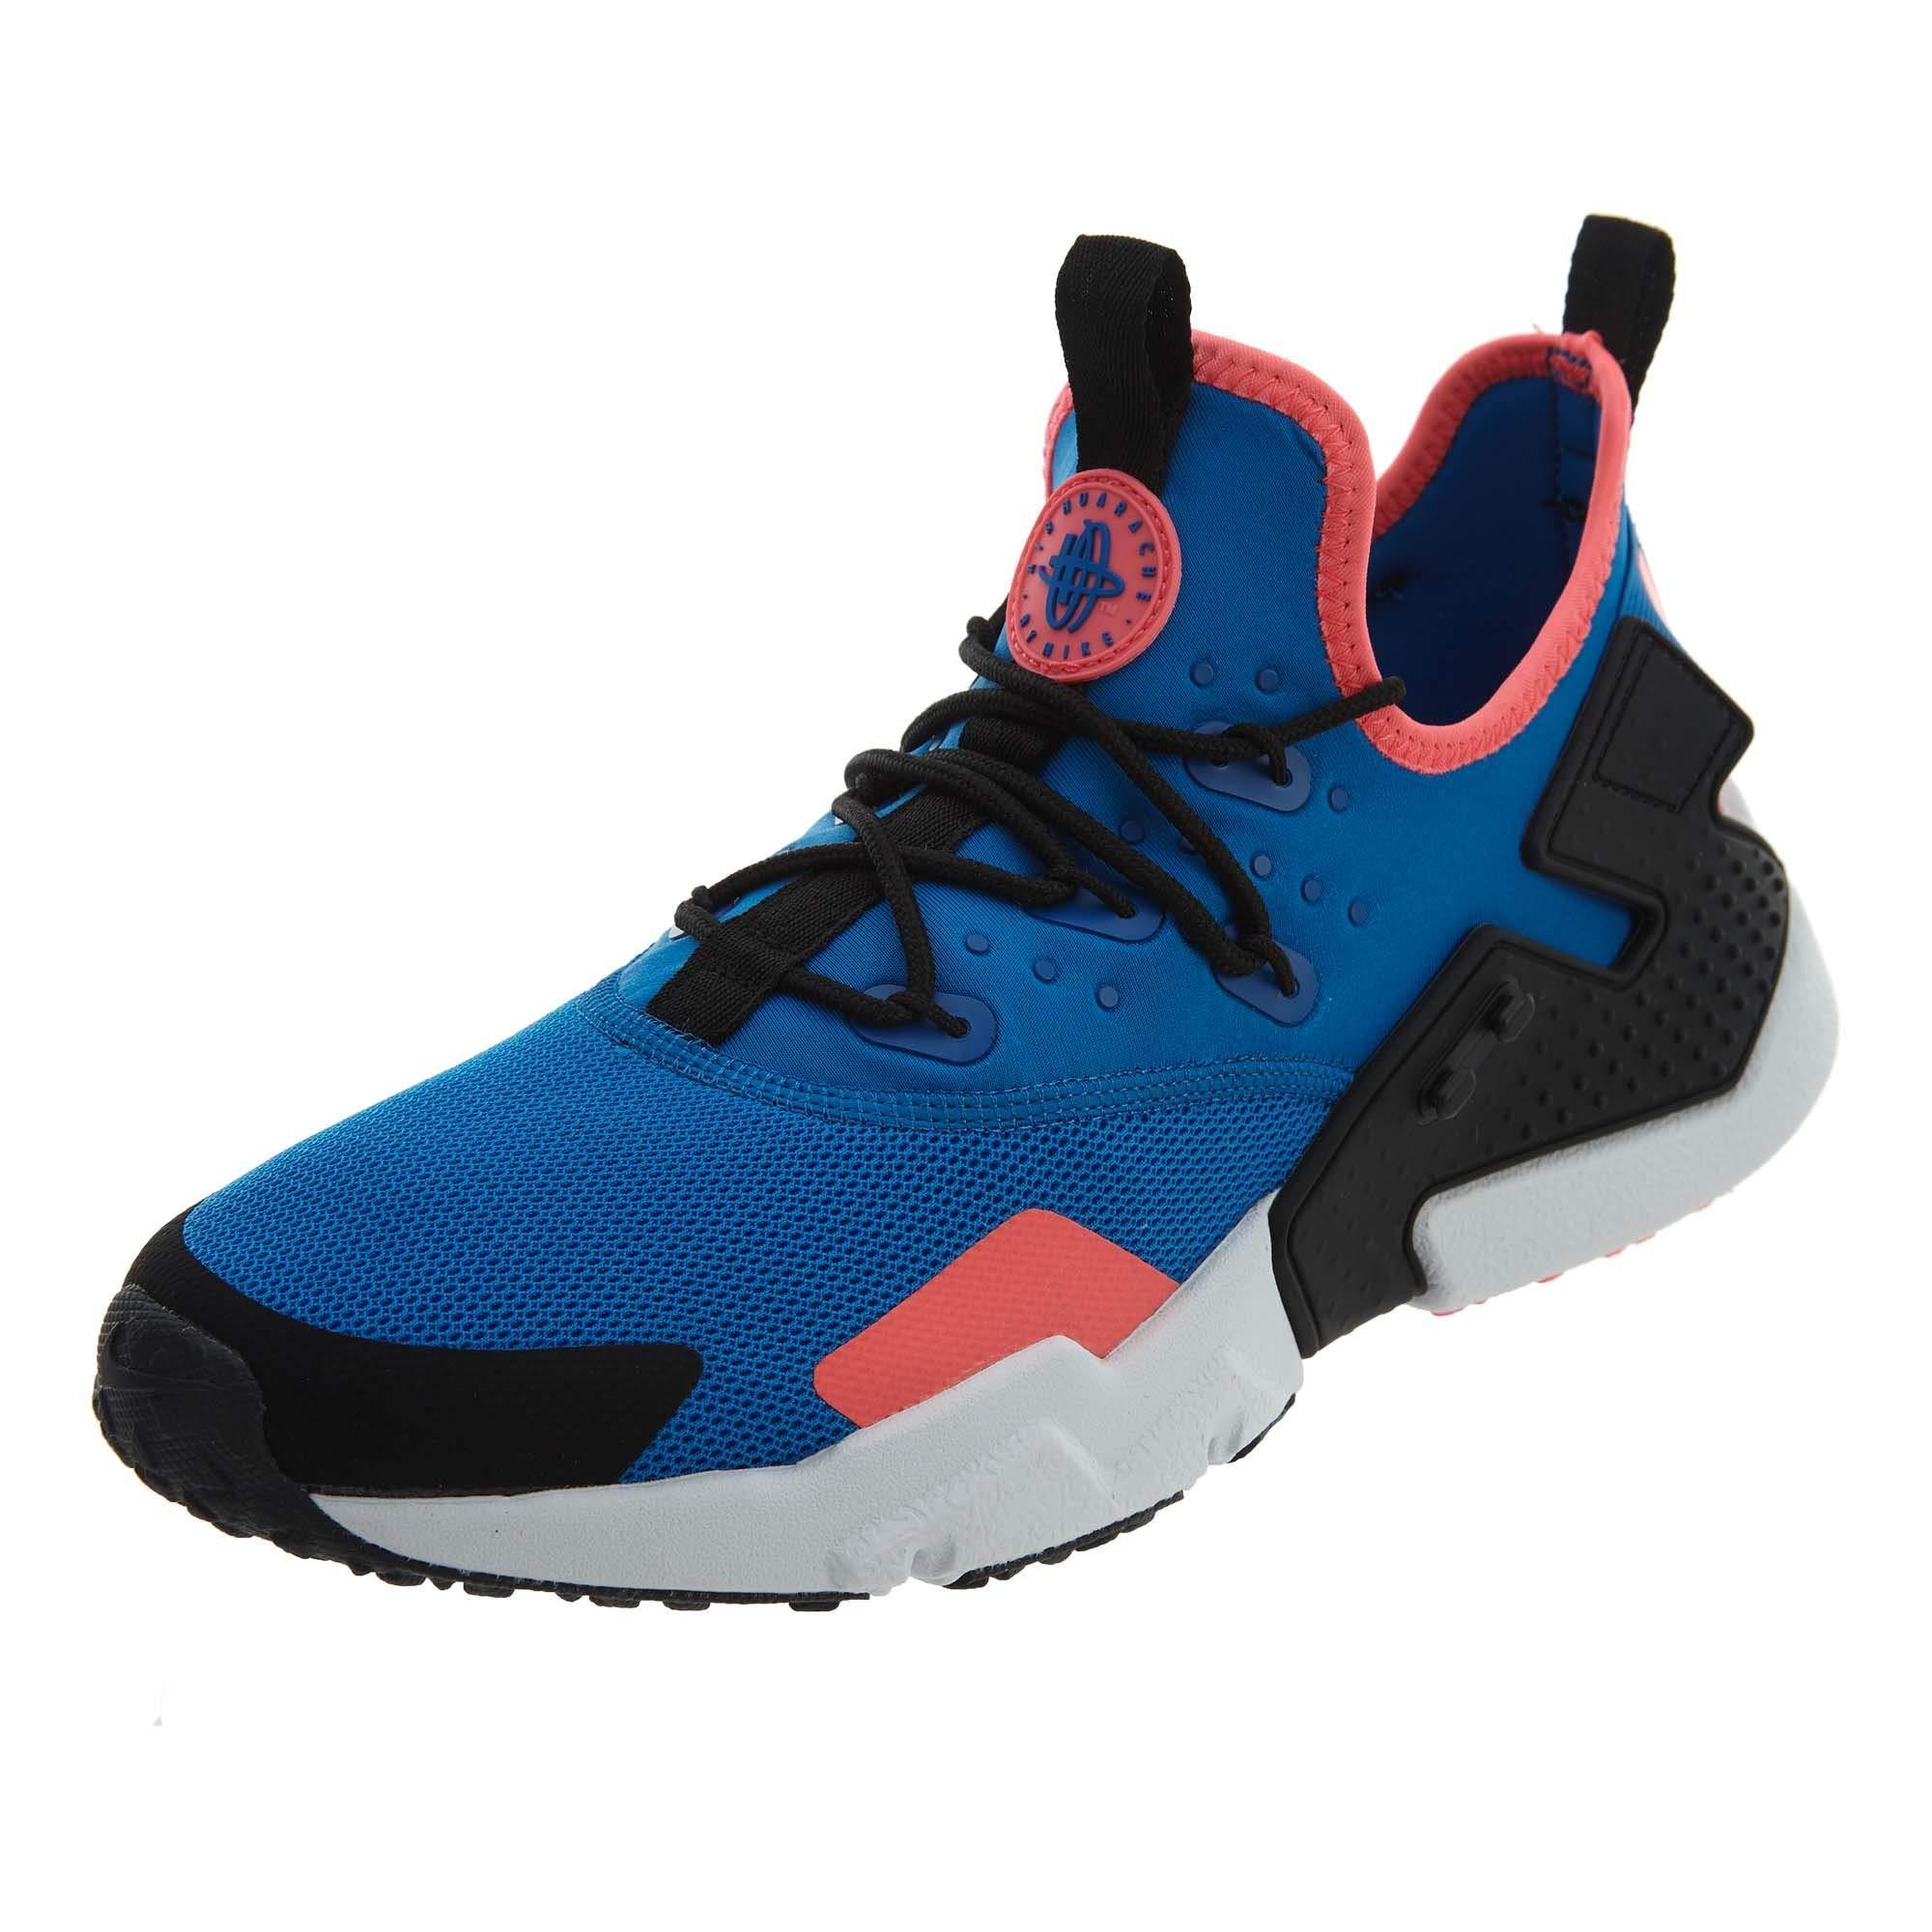 841e0af2b936b Nike Men's Air Huarache Drift Running, Blue Nebula/Black-Black-White, Size  8.5